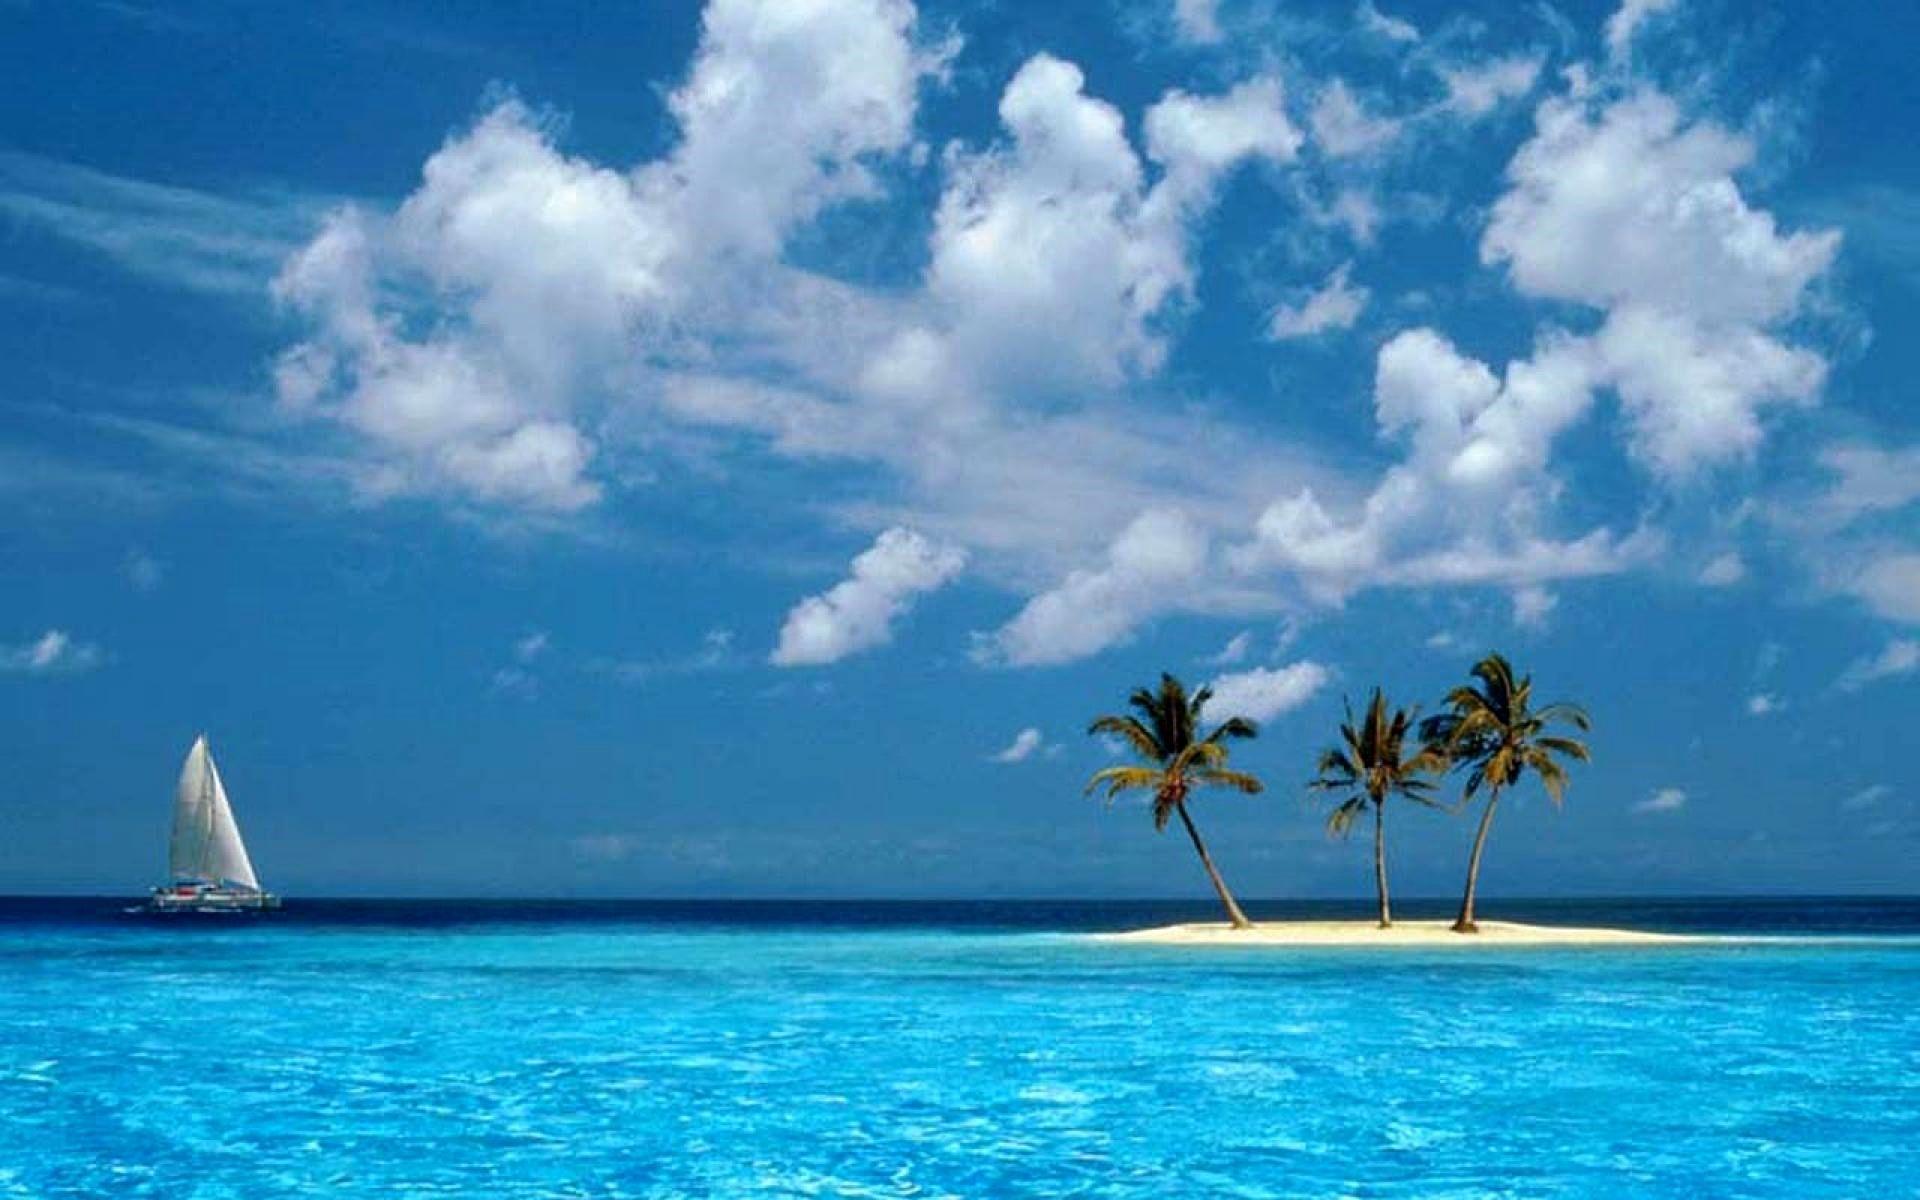 Wallpaper 4k Windows Xp Gallery Tropical Beach Tropical Windows Scenery